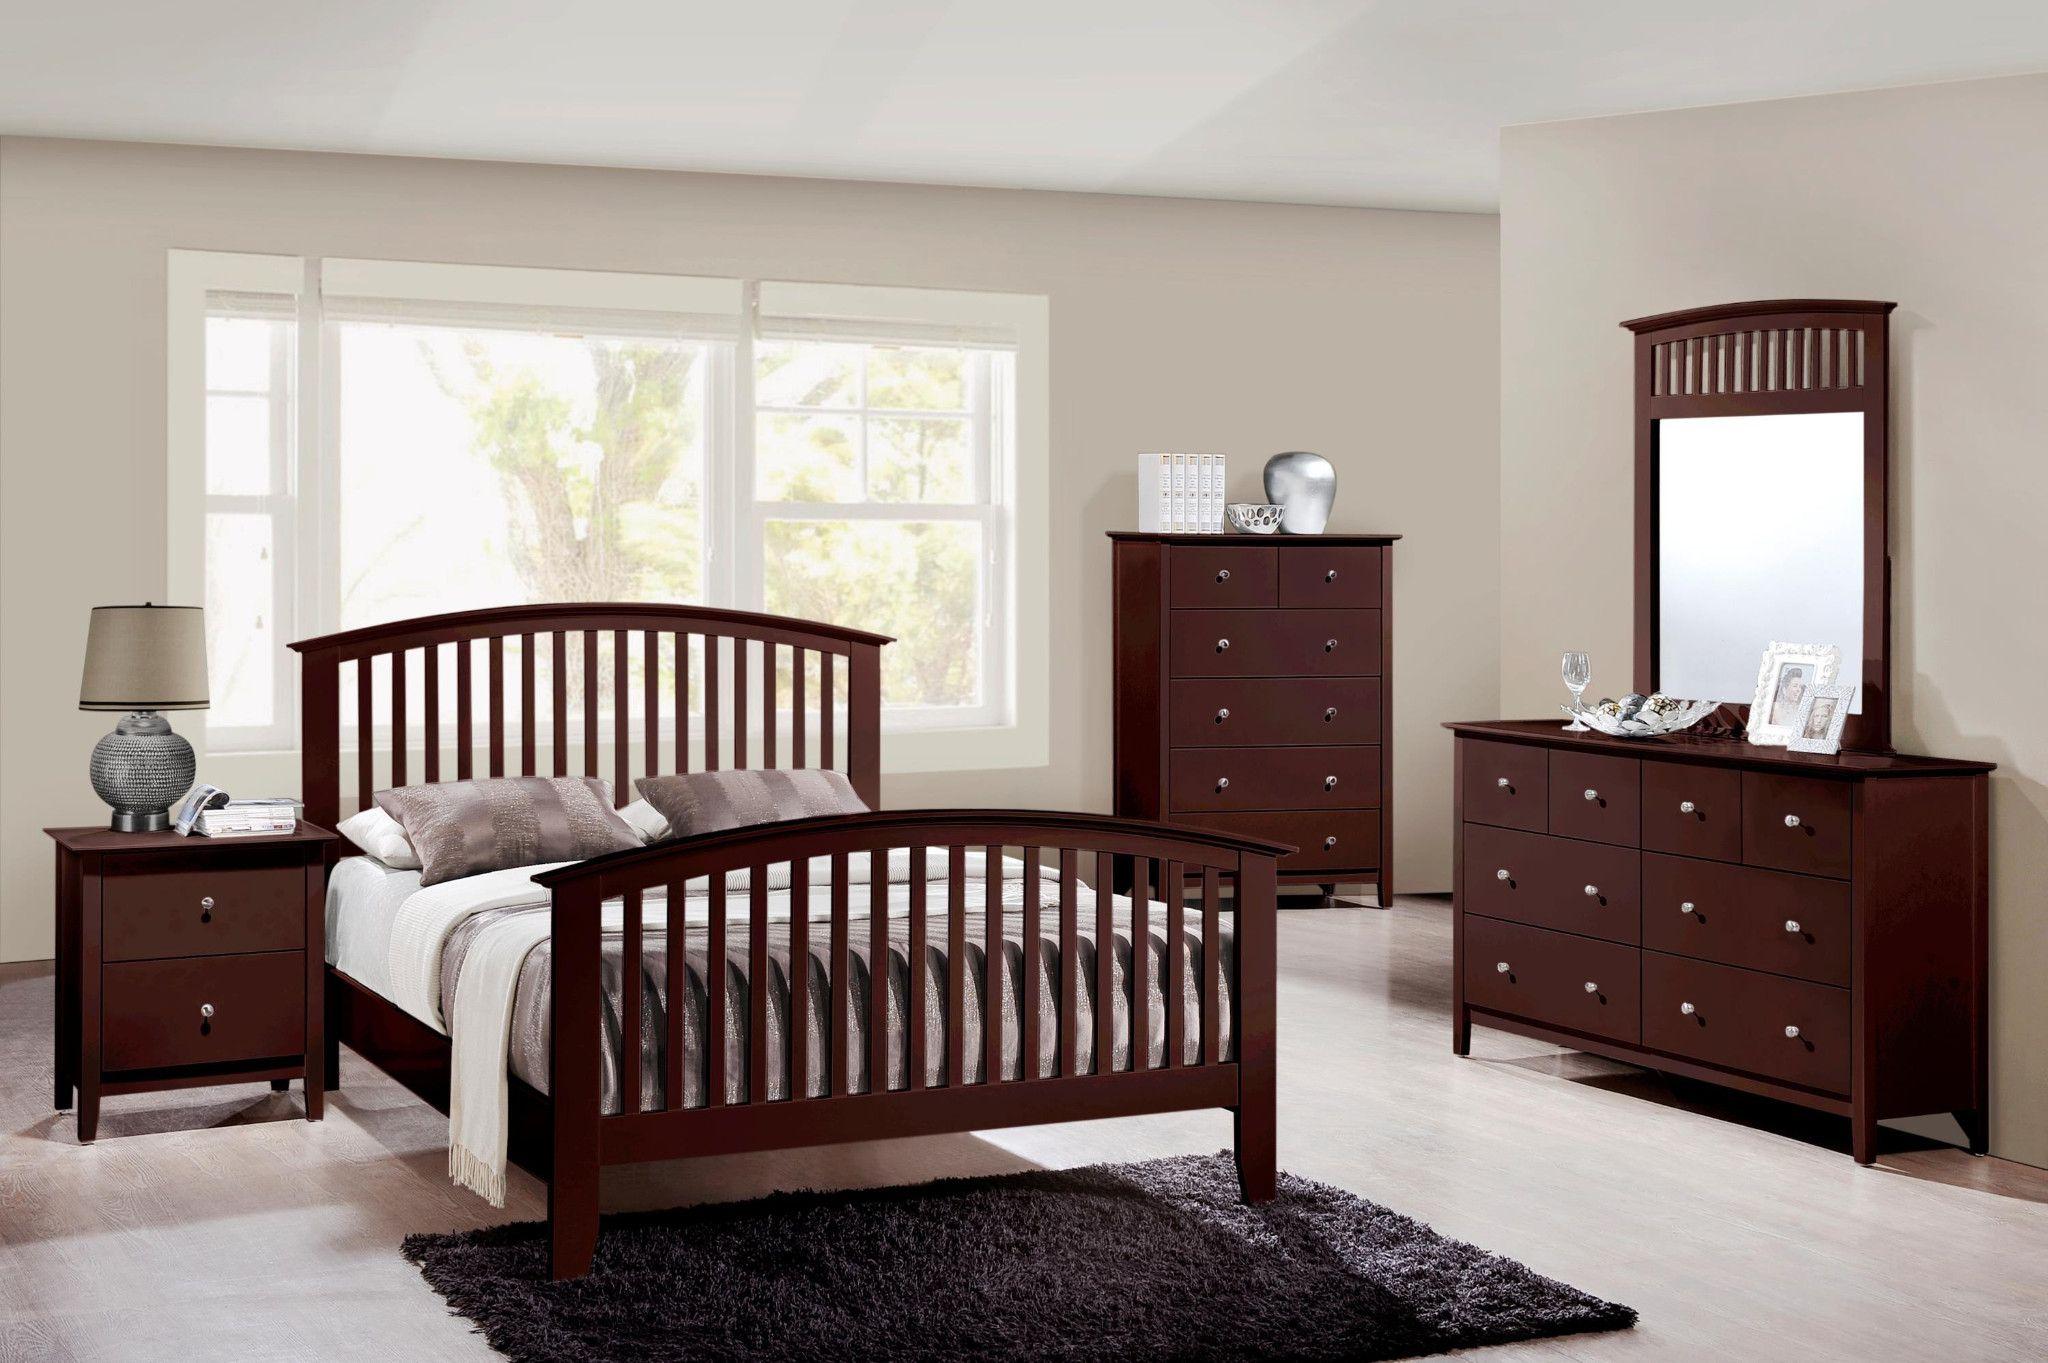 Lawson 4 Piece Bedroom Suite $4.4 Full or Queen $4.4 King